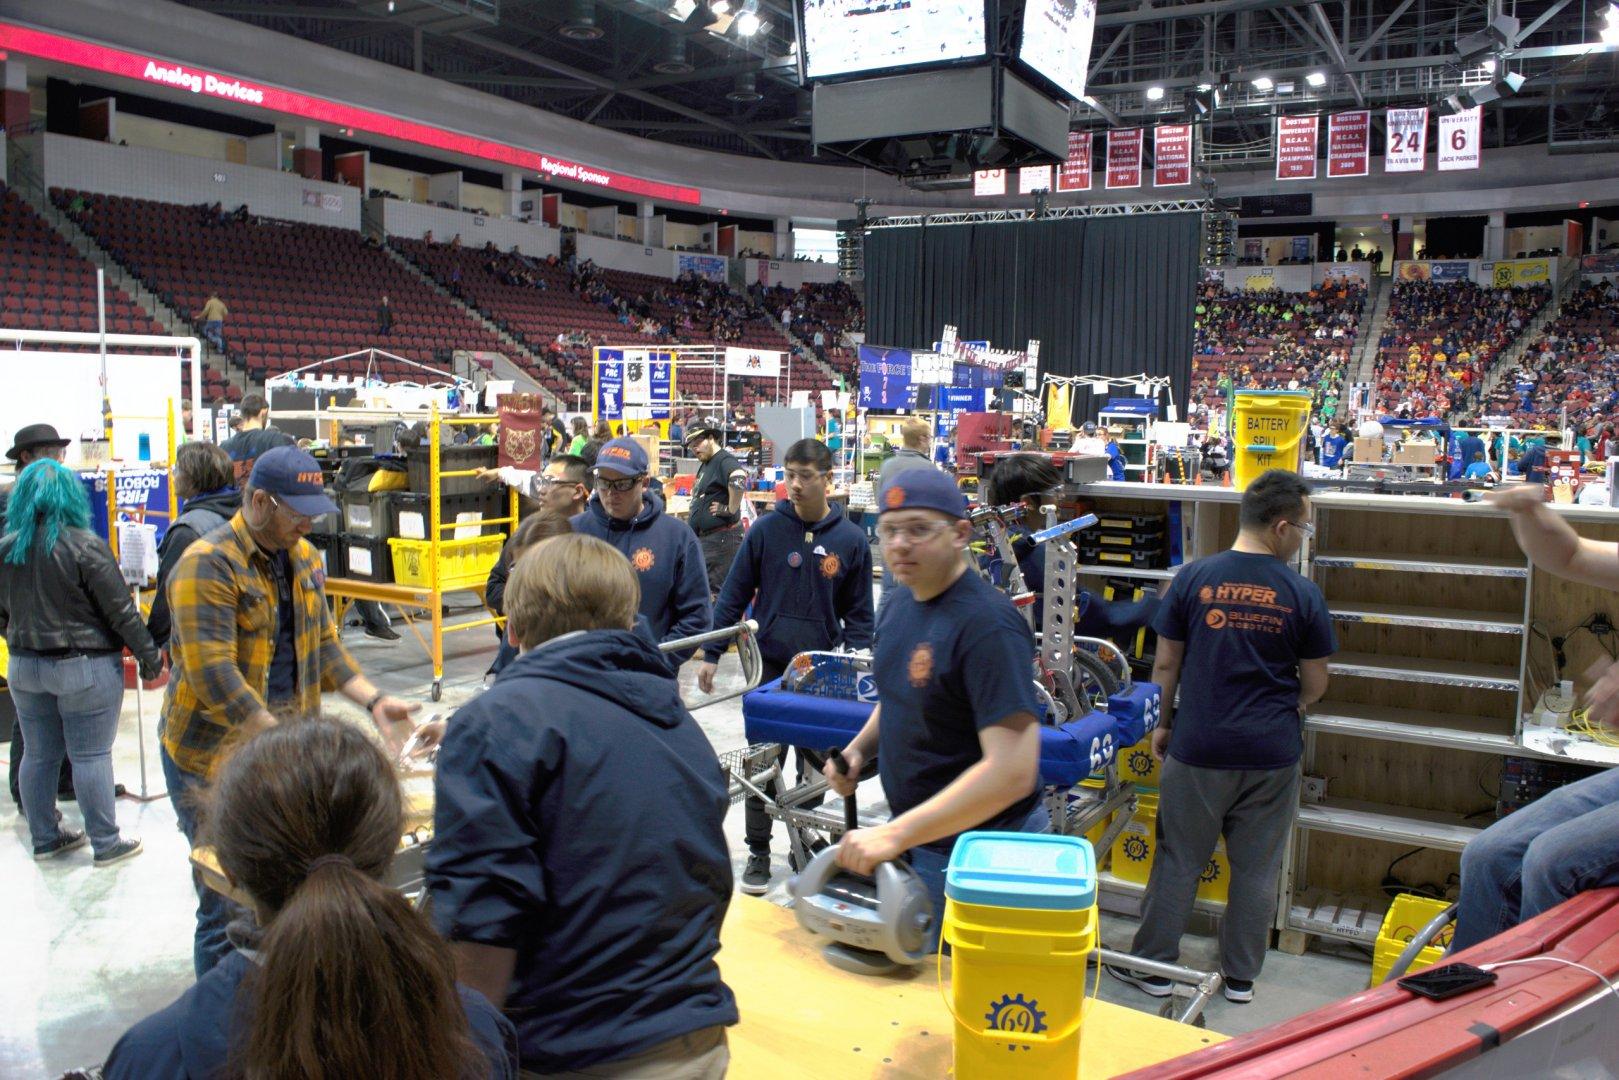 187.Boston FIRST Robotics Competition 04-03-2016.jpg